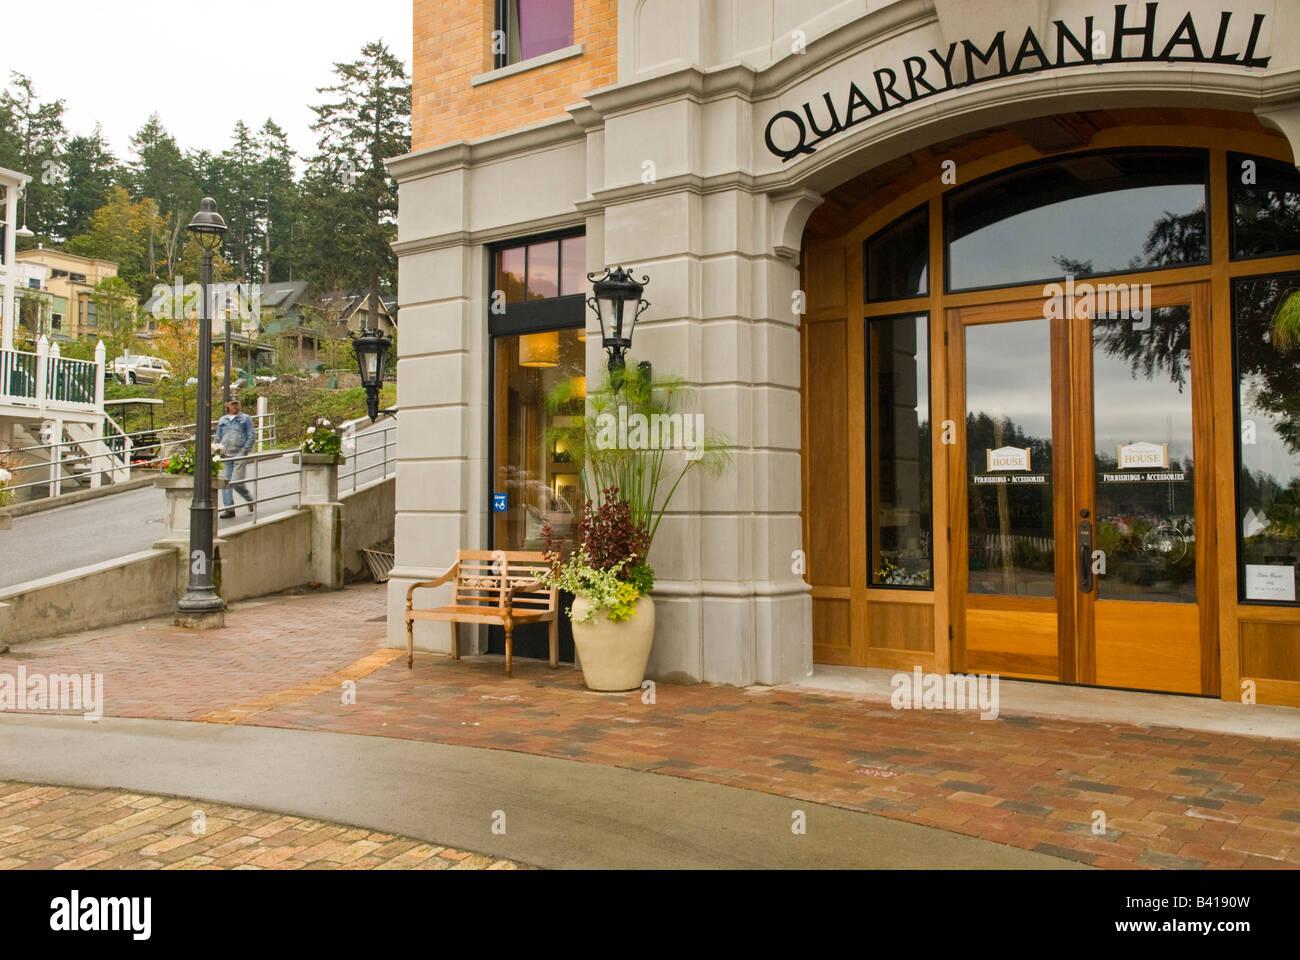 USA, WA, San Juan Island.  Quarryman Hall addition to historic Roche Harbor and Hotel de Haro resort - Stock Image